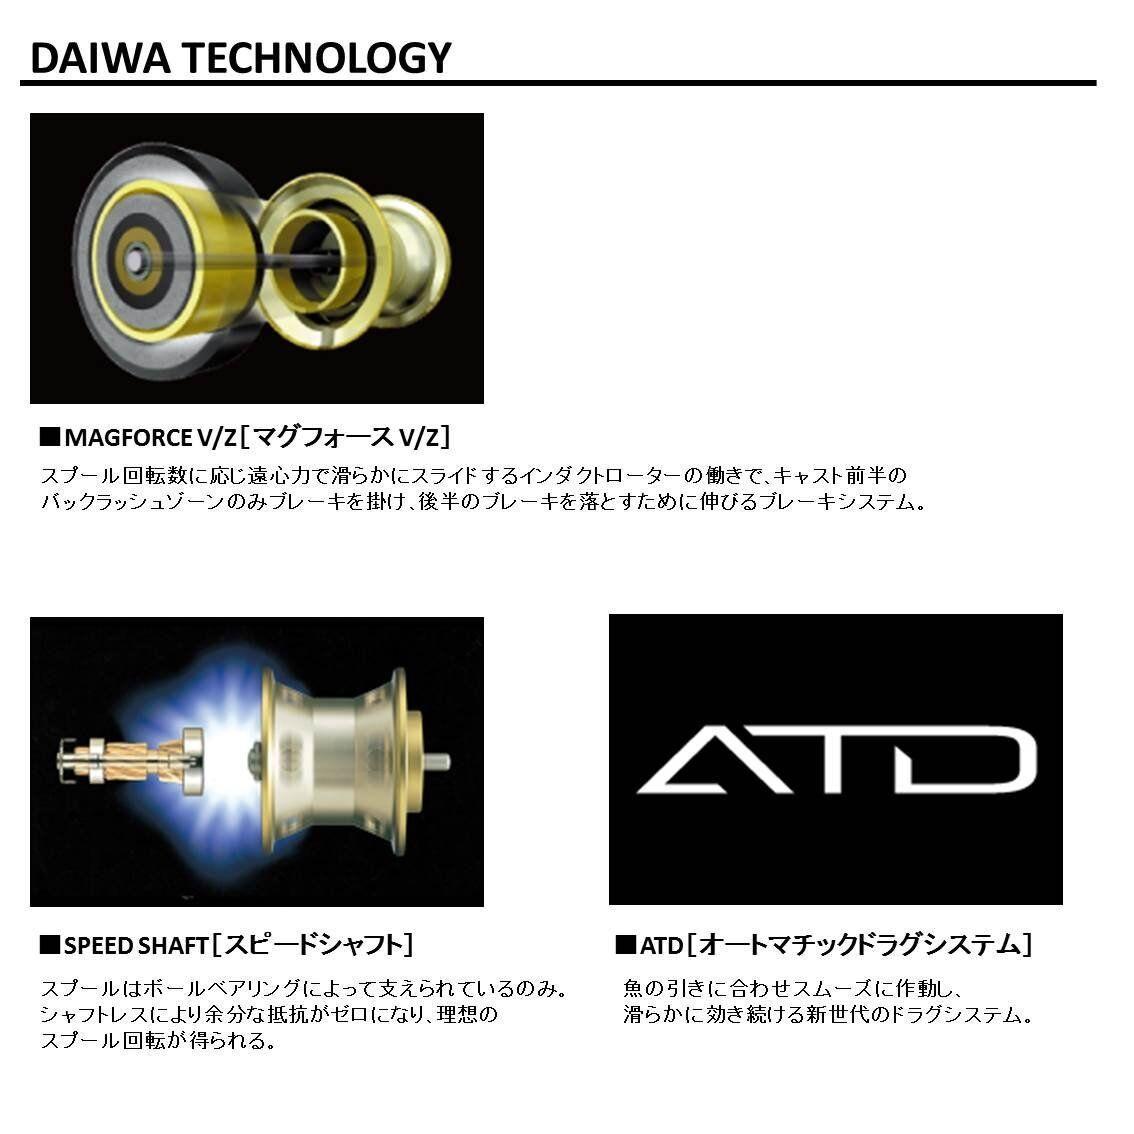 Daiwa casting 18 Ryoga 1016H Right handle Bait casting Daiwa reel from Japan New a18ebc